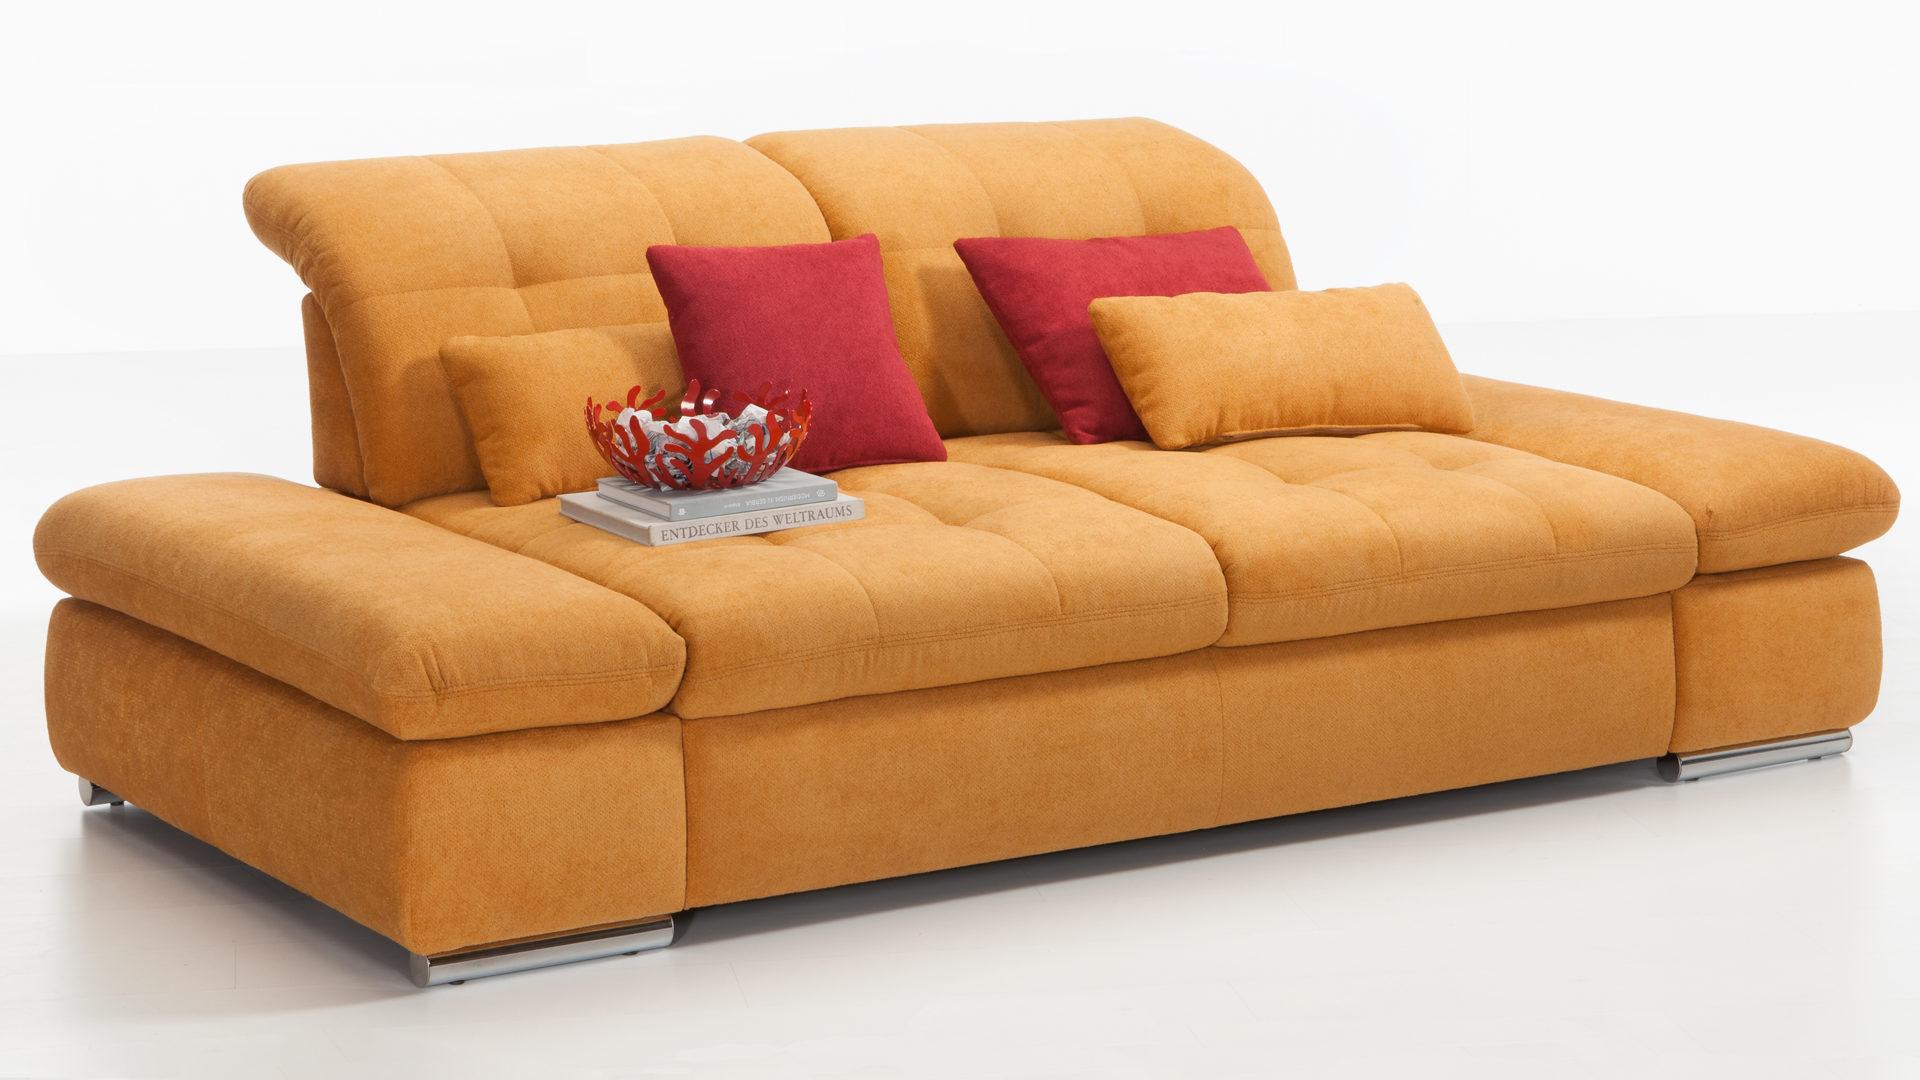 Kawoo 2 Sitzer Sofa Santa Lucia Mit Federkern Maisfarbener Bezug